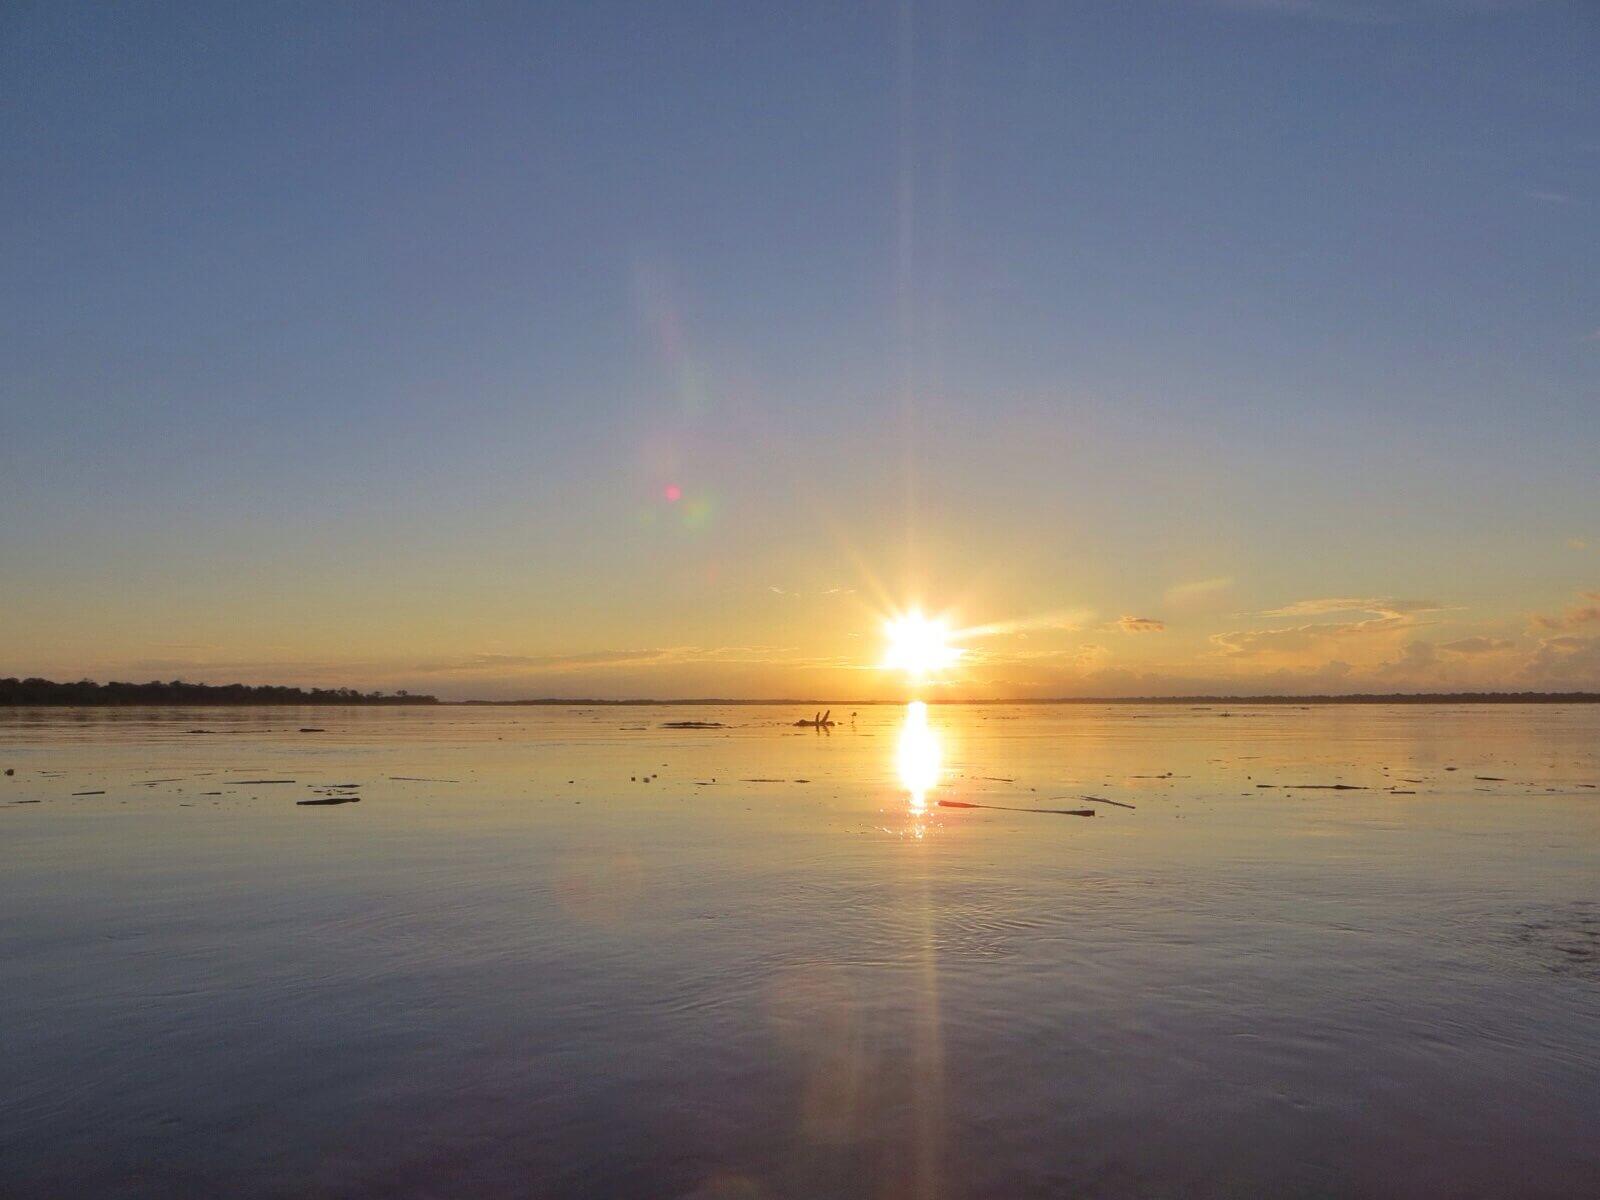 Aurinko laskee Peruun...